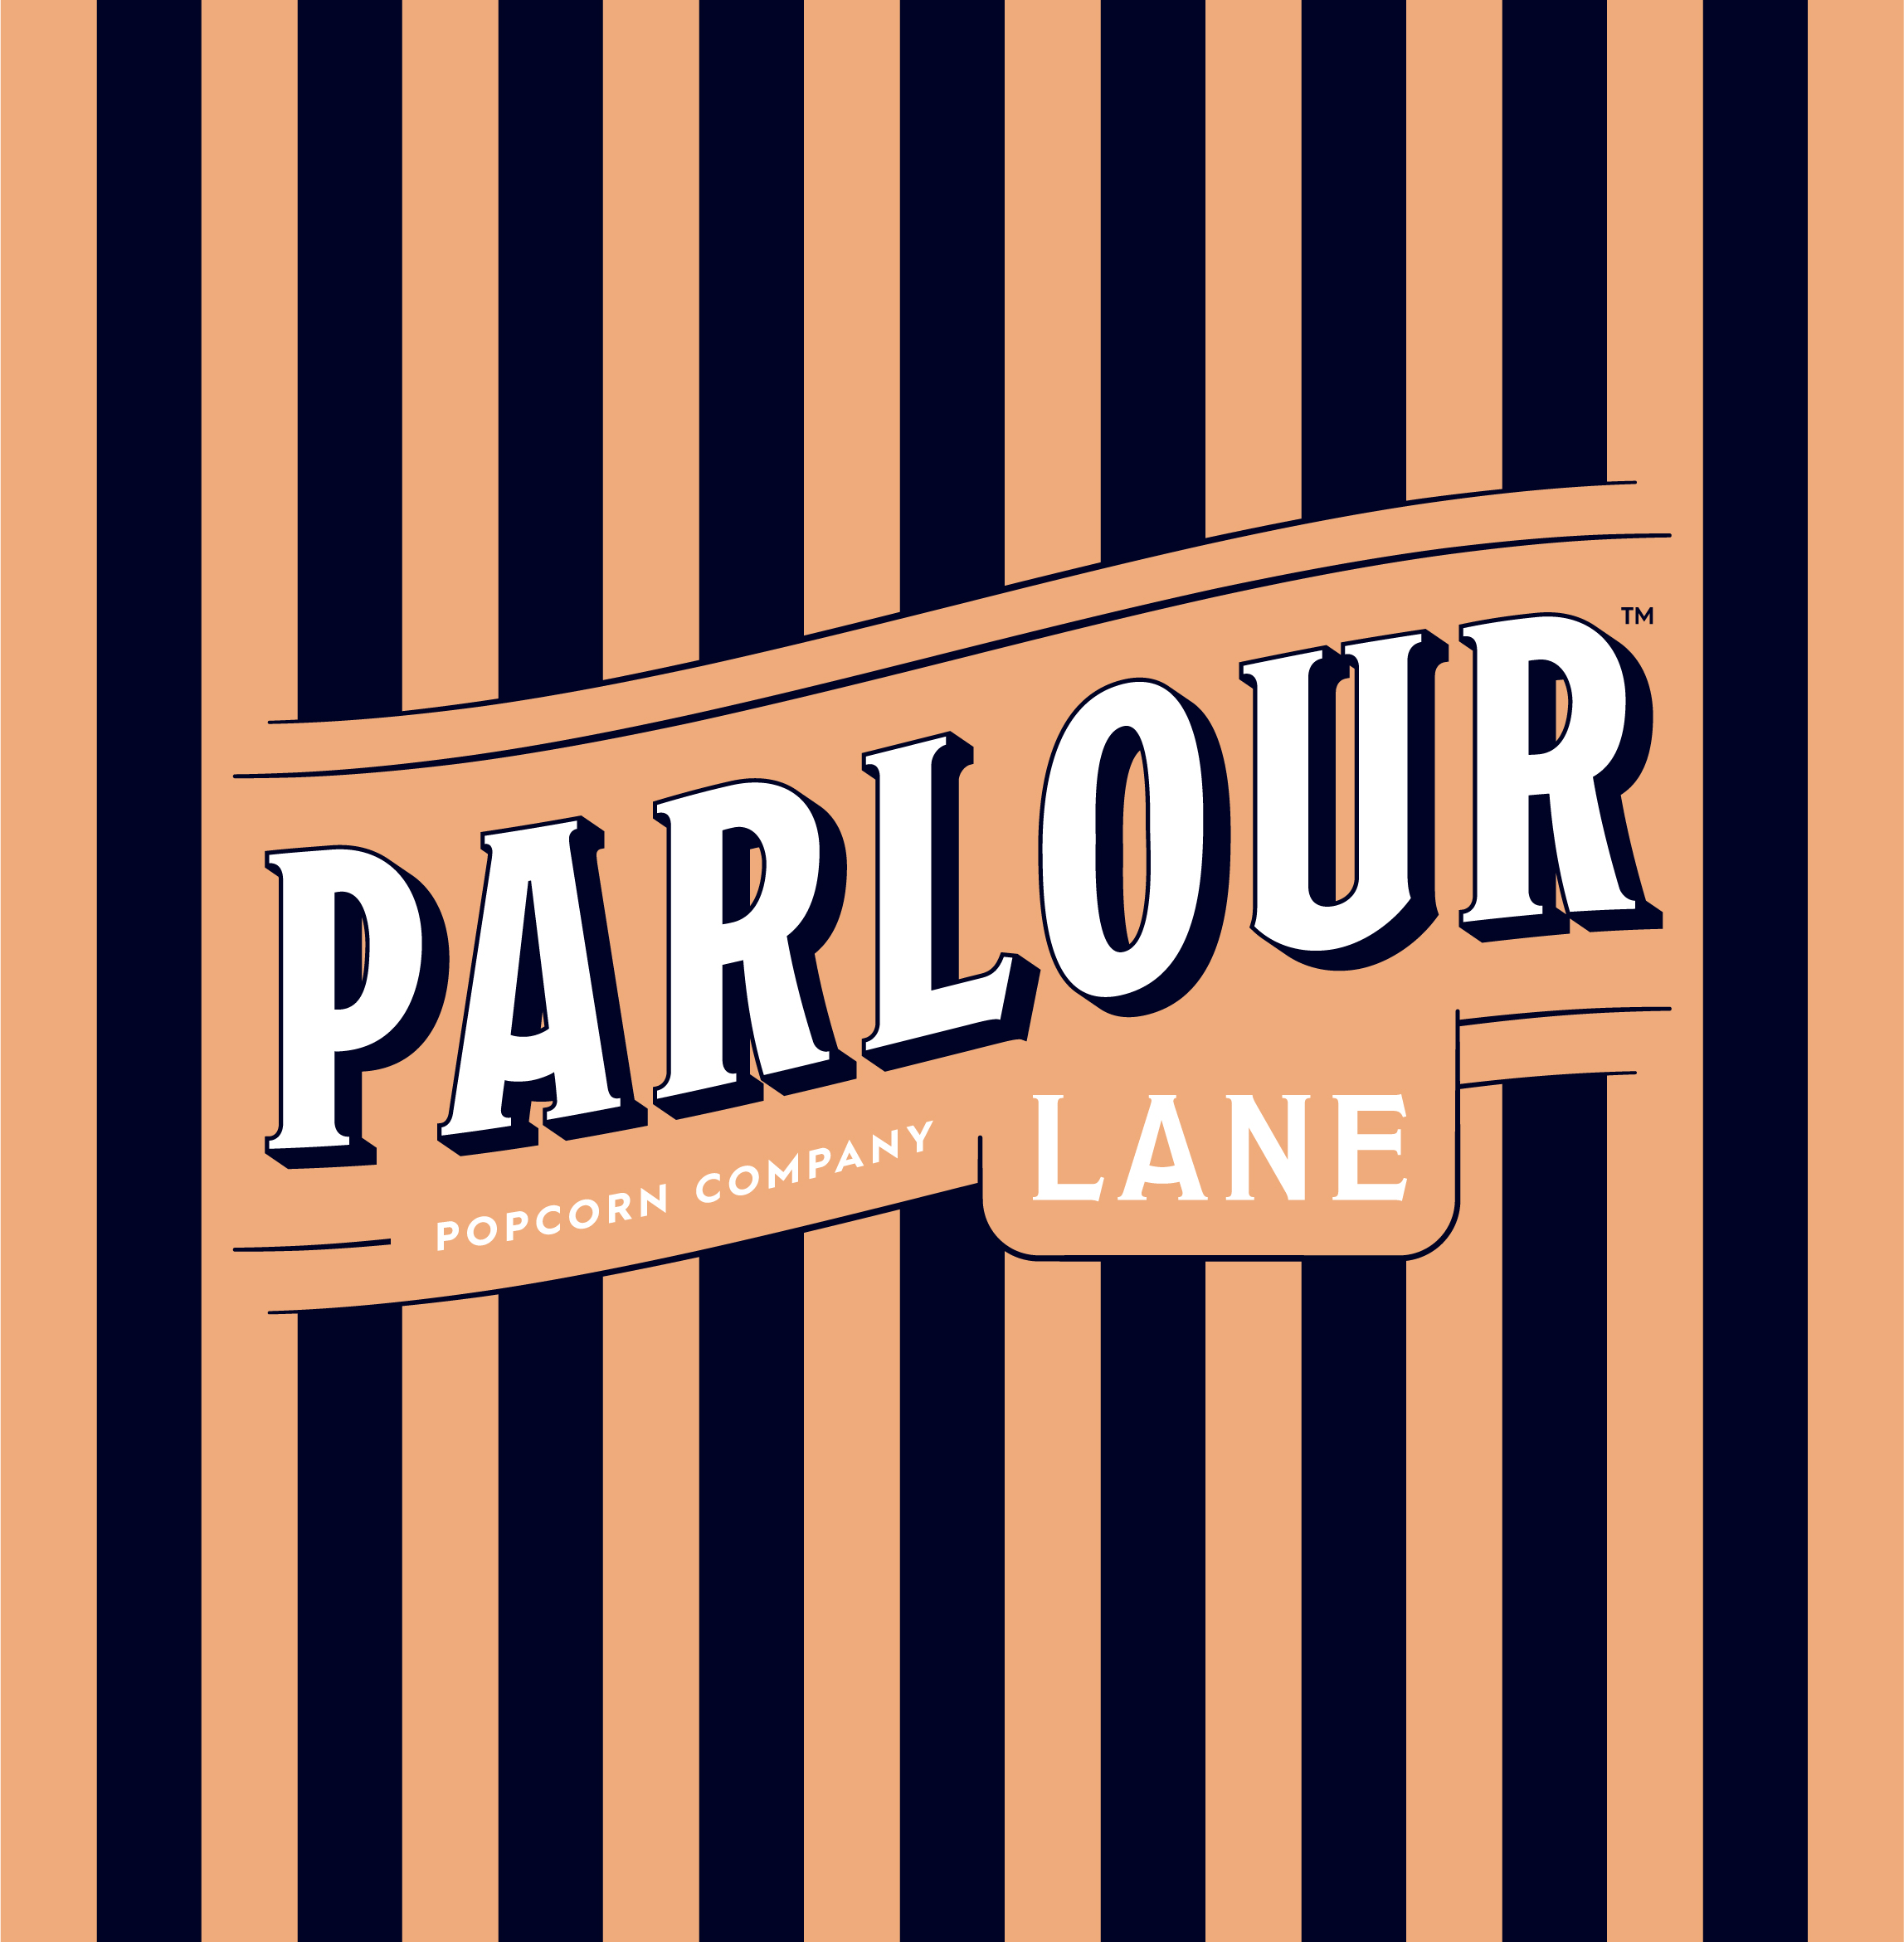 Parlour Lane Logo Design